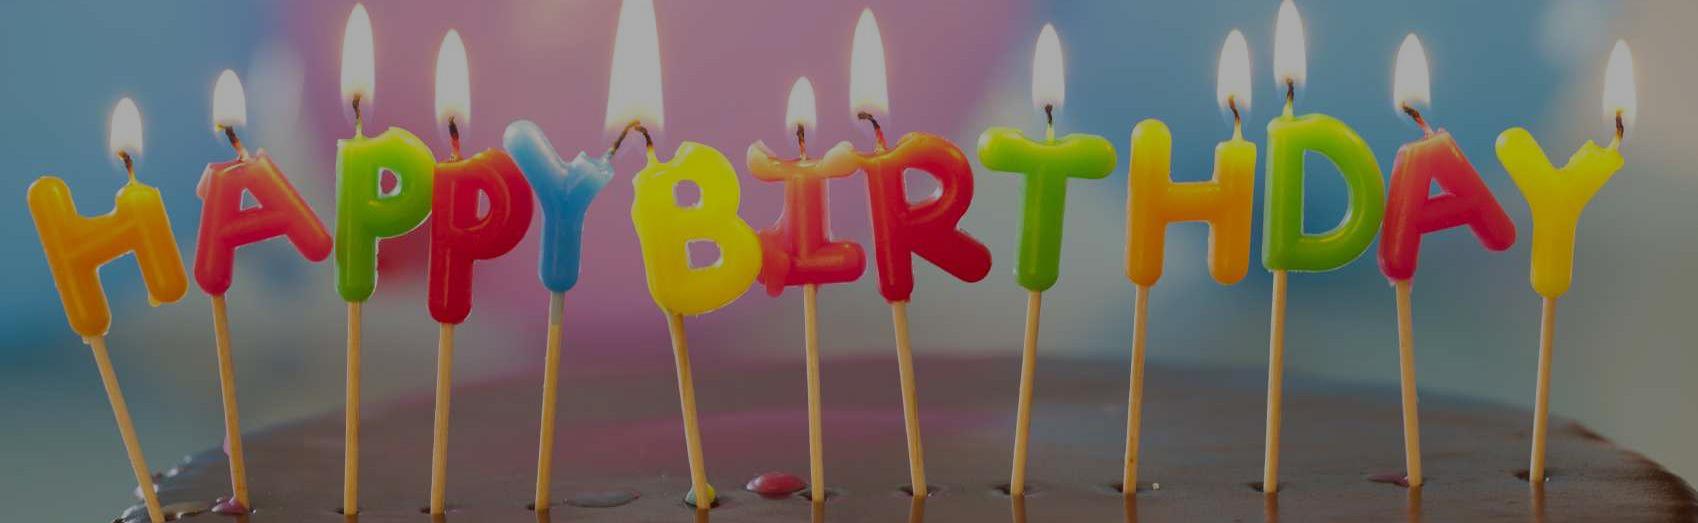 My Birthday for the MACC Fund